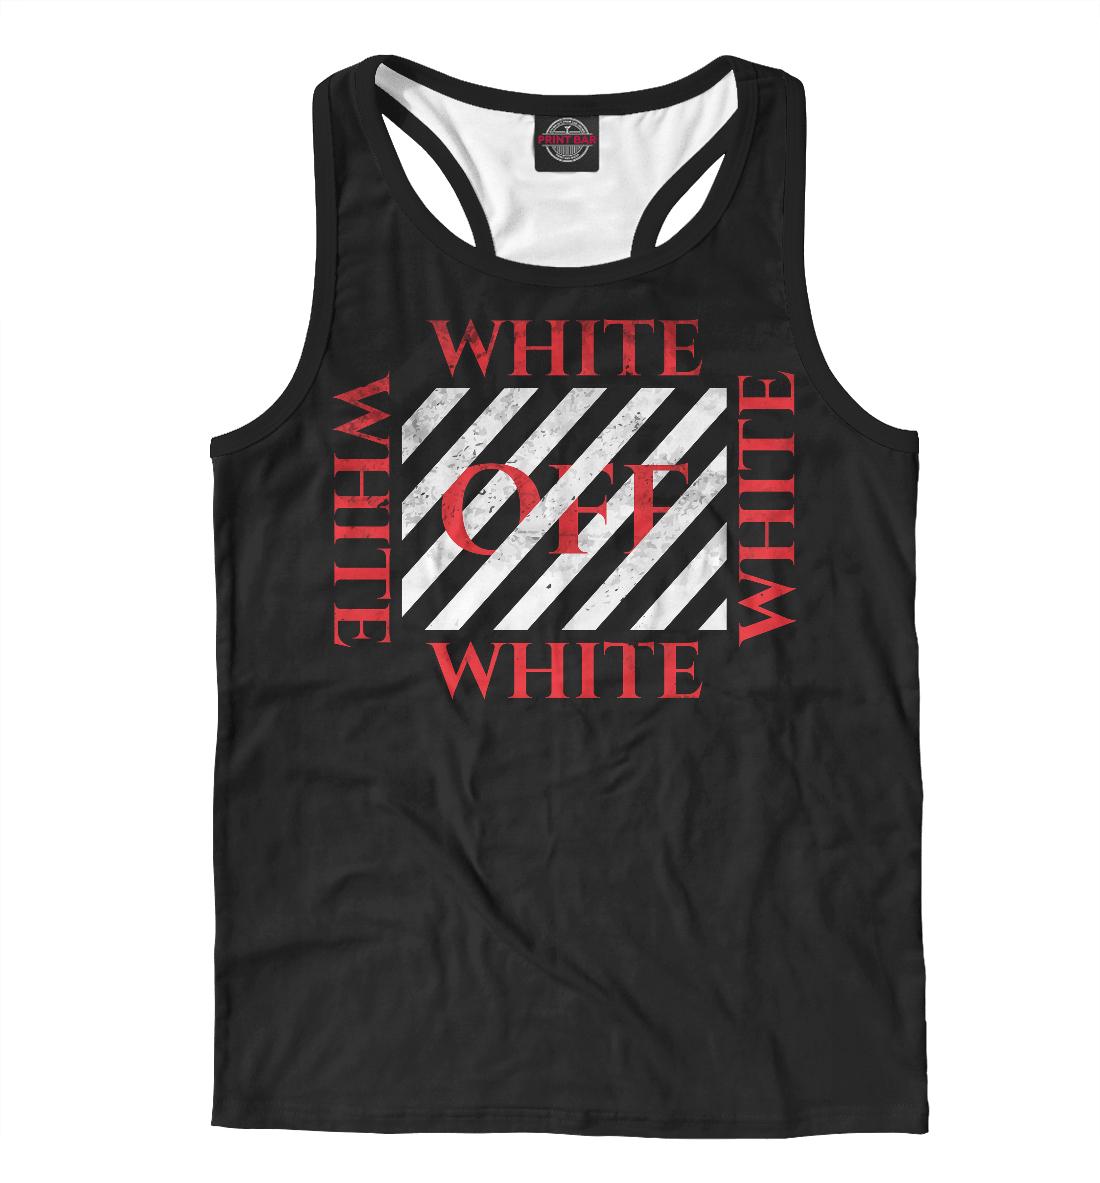 Купить Off-White GG Style, Printbar, Майки борцовки, APD-461144-mayb-2